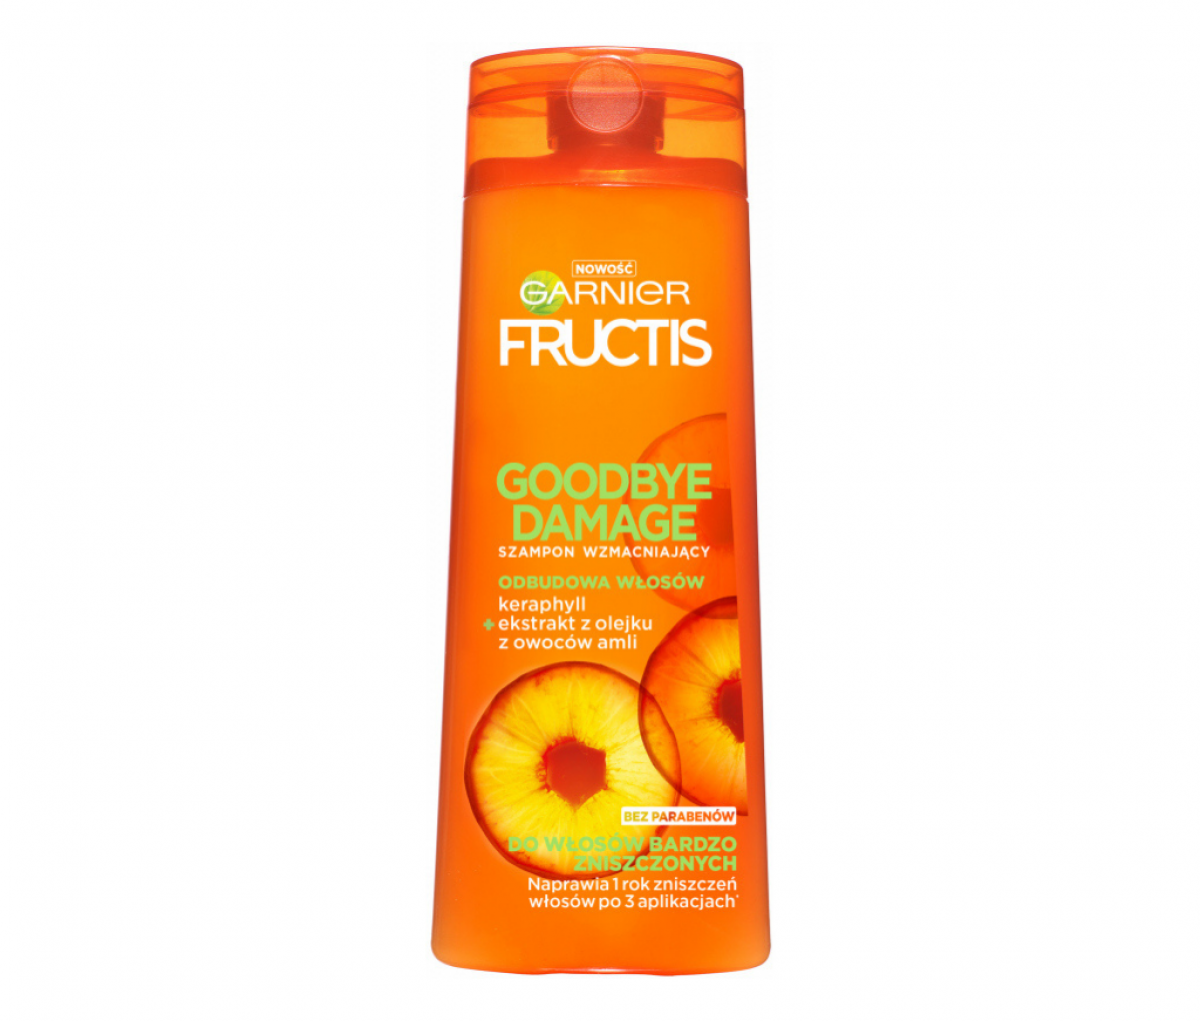 Garnier 400ml Fructis Goodbye Damage Shampoo